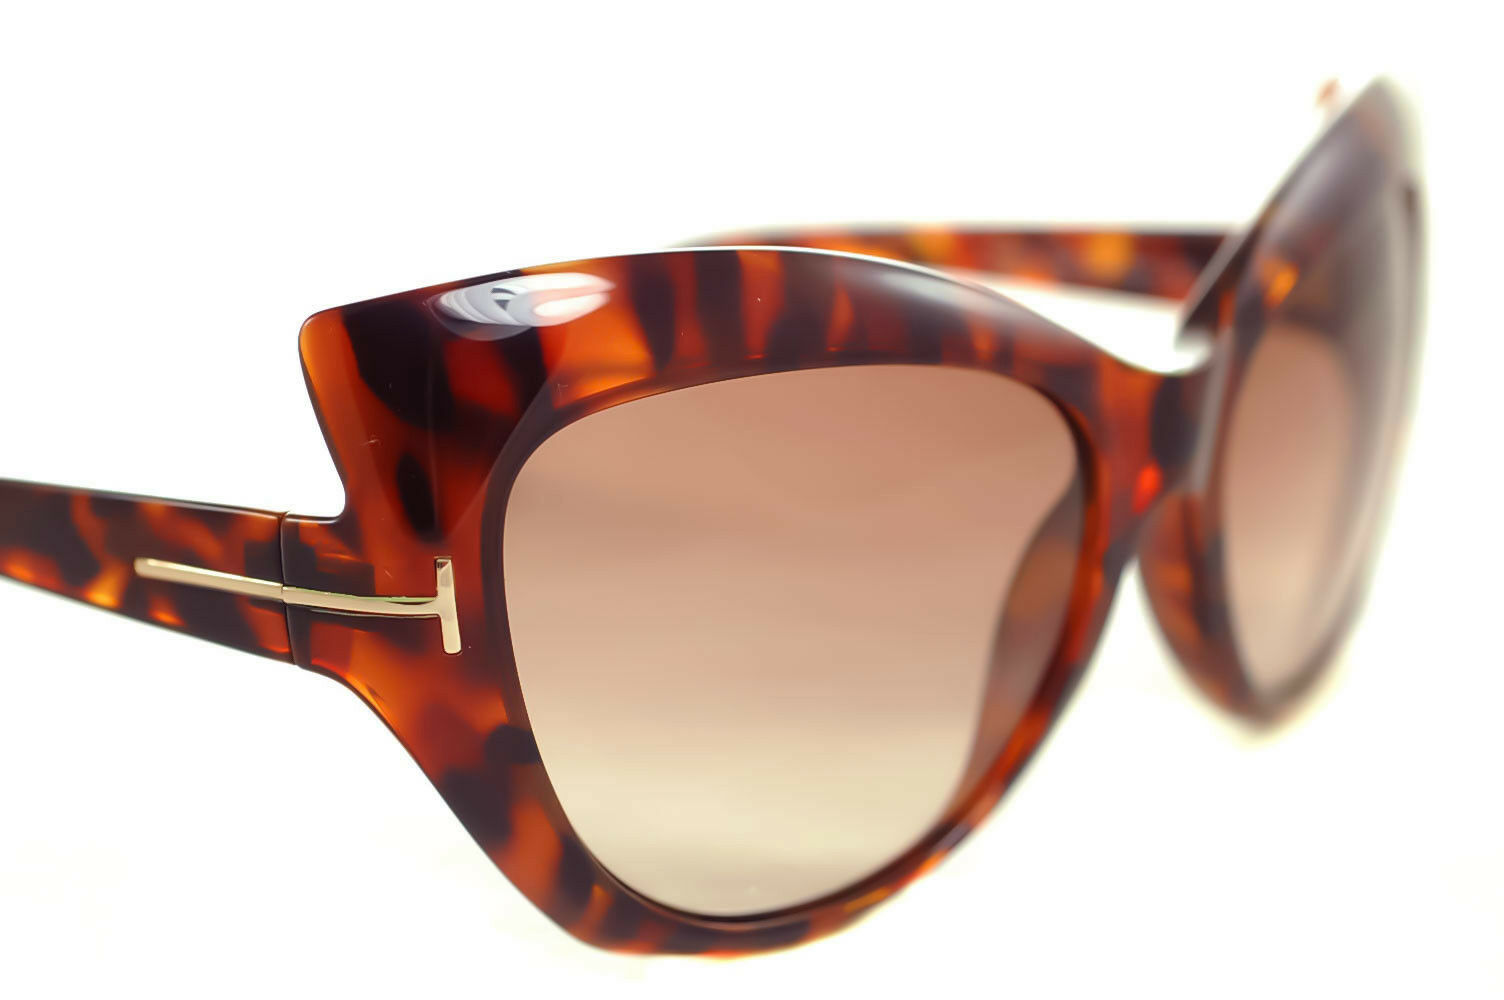 27af12a514 TOM FORD BARDOT tf284 52f Mujer Ojos De Gato Gafas de sol Mariposa Marrón  Havana